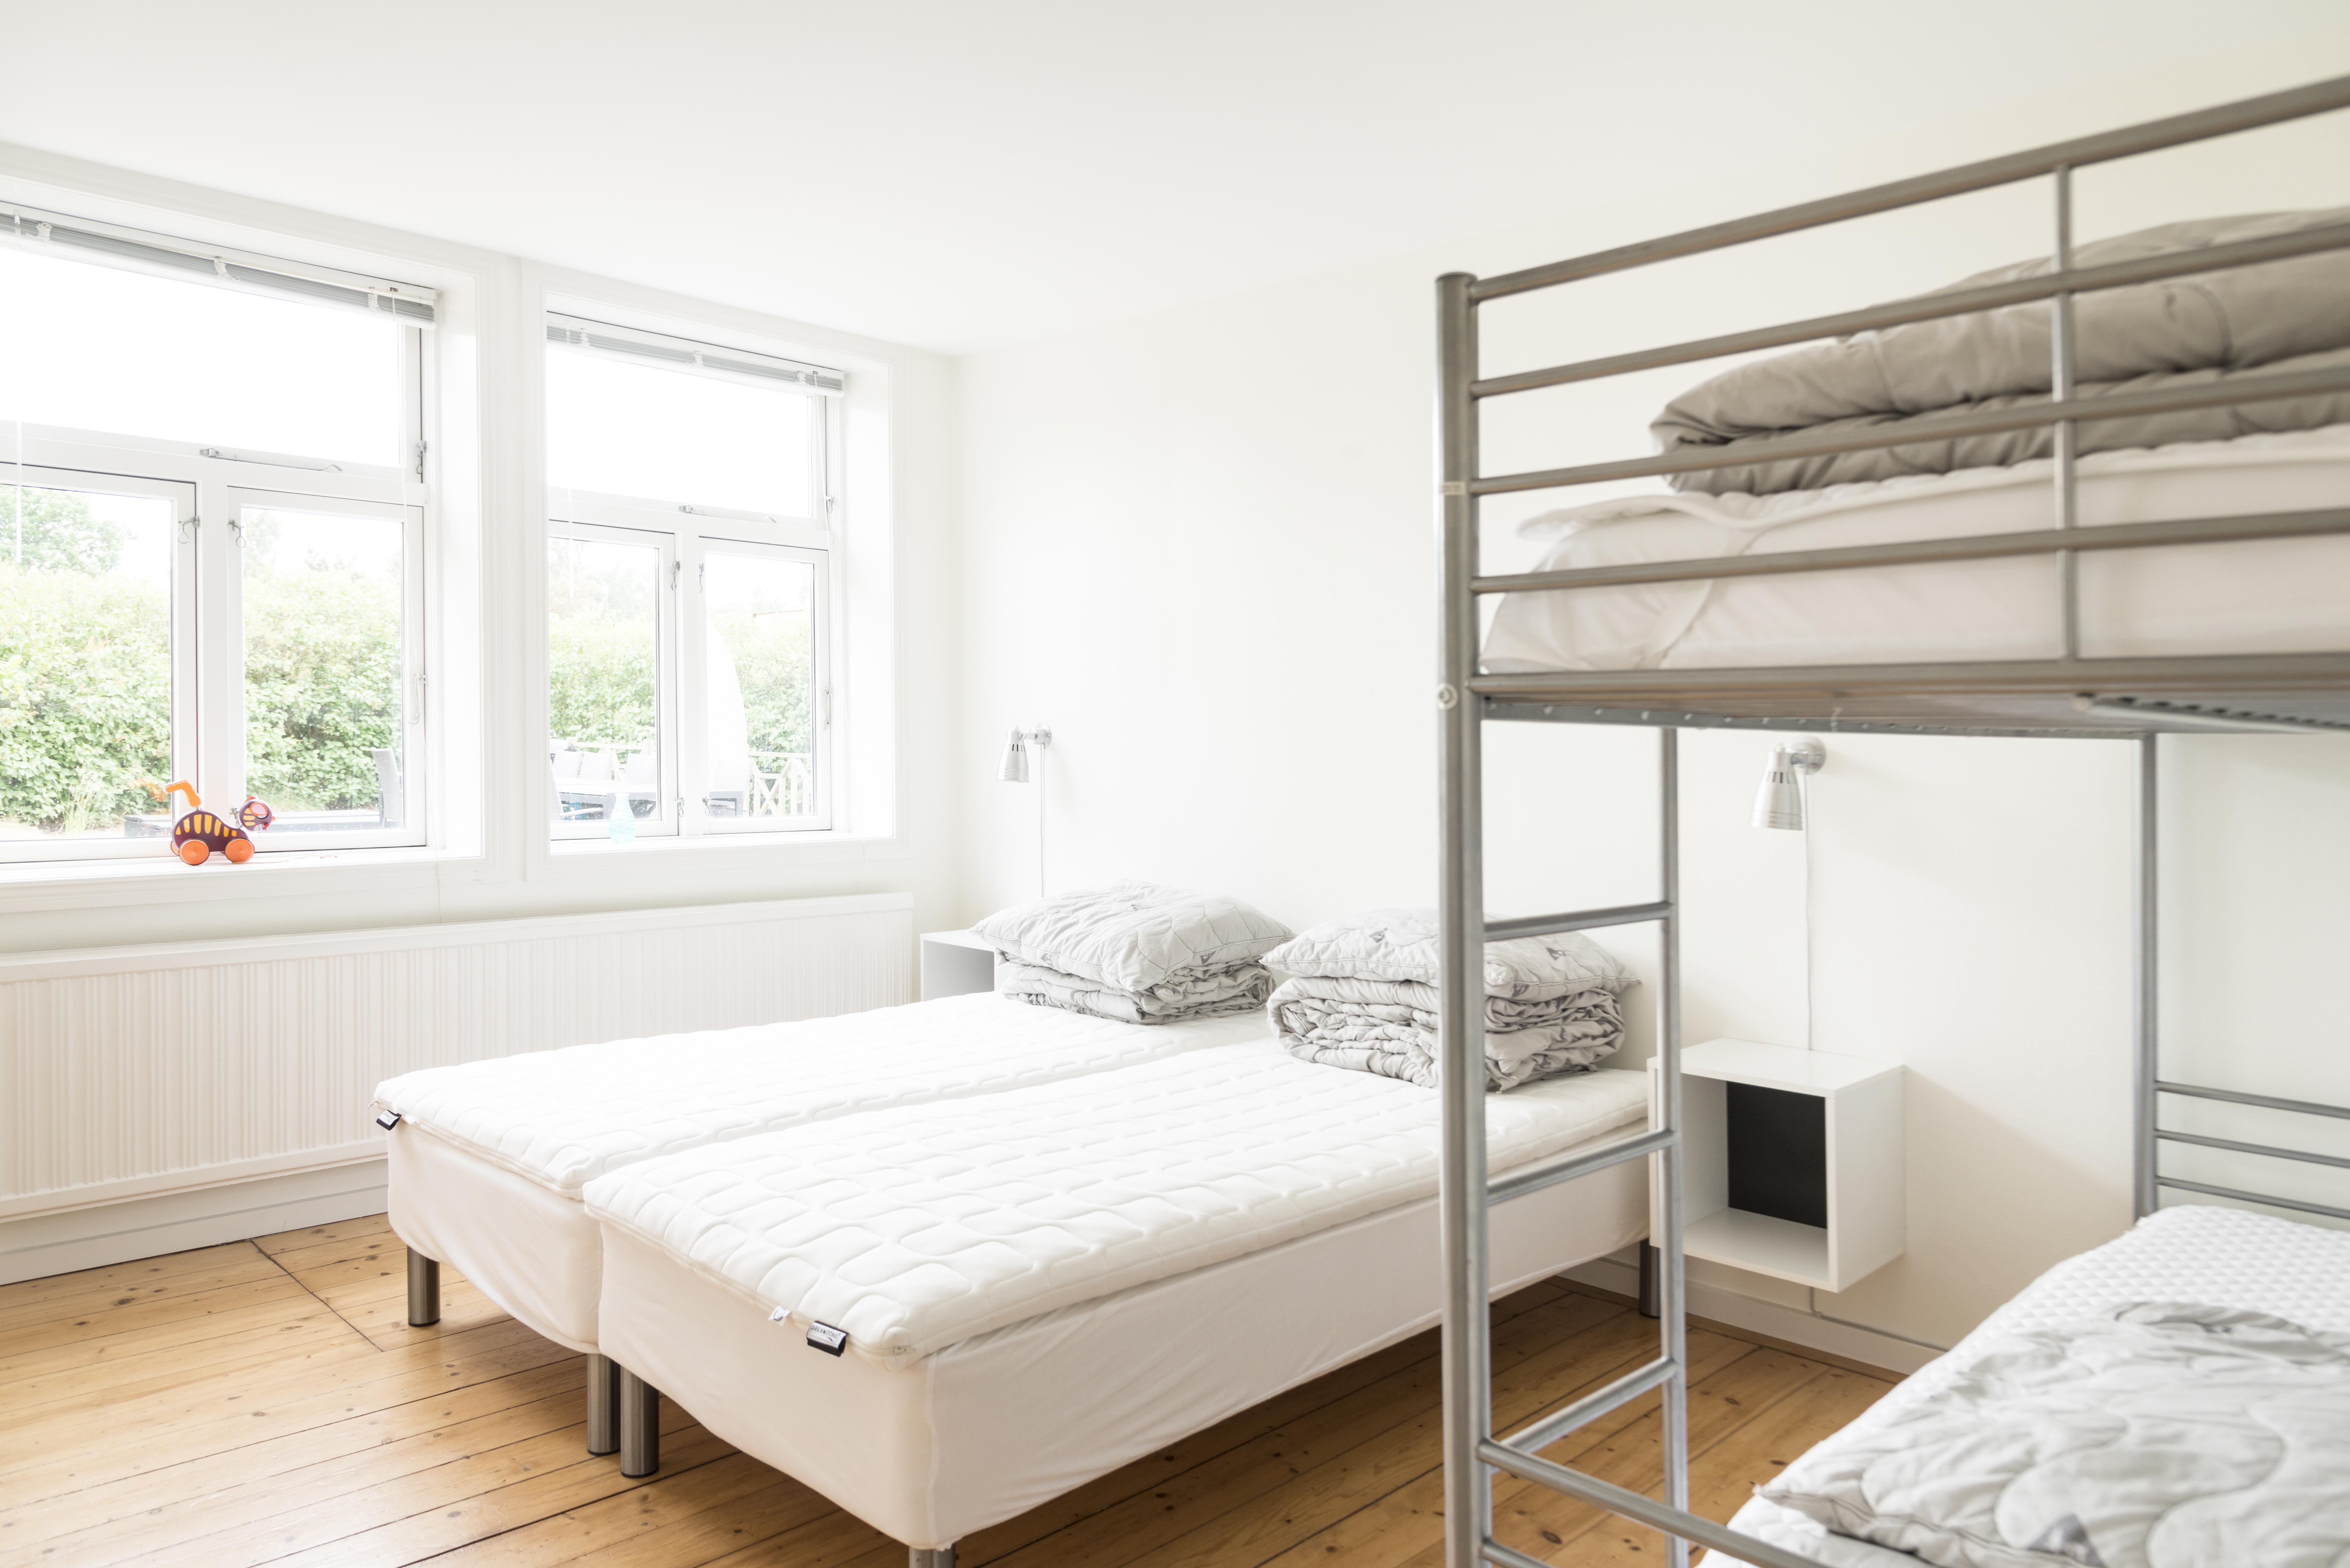 Gode senge og madrasser